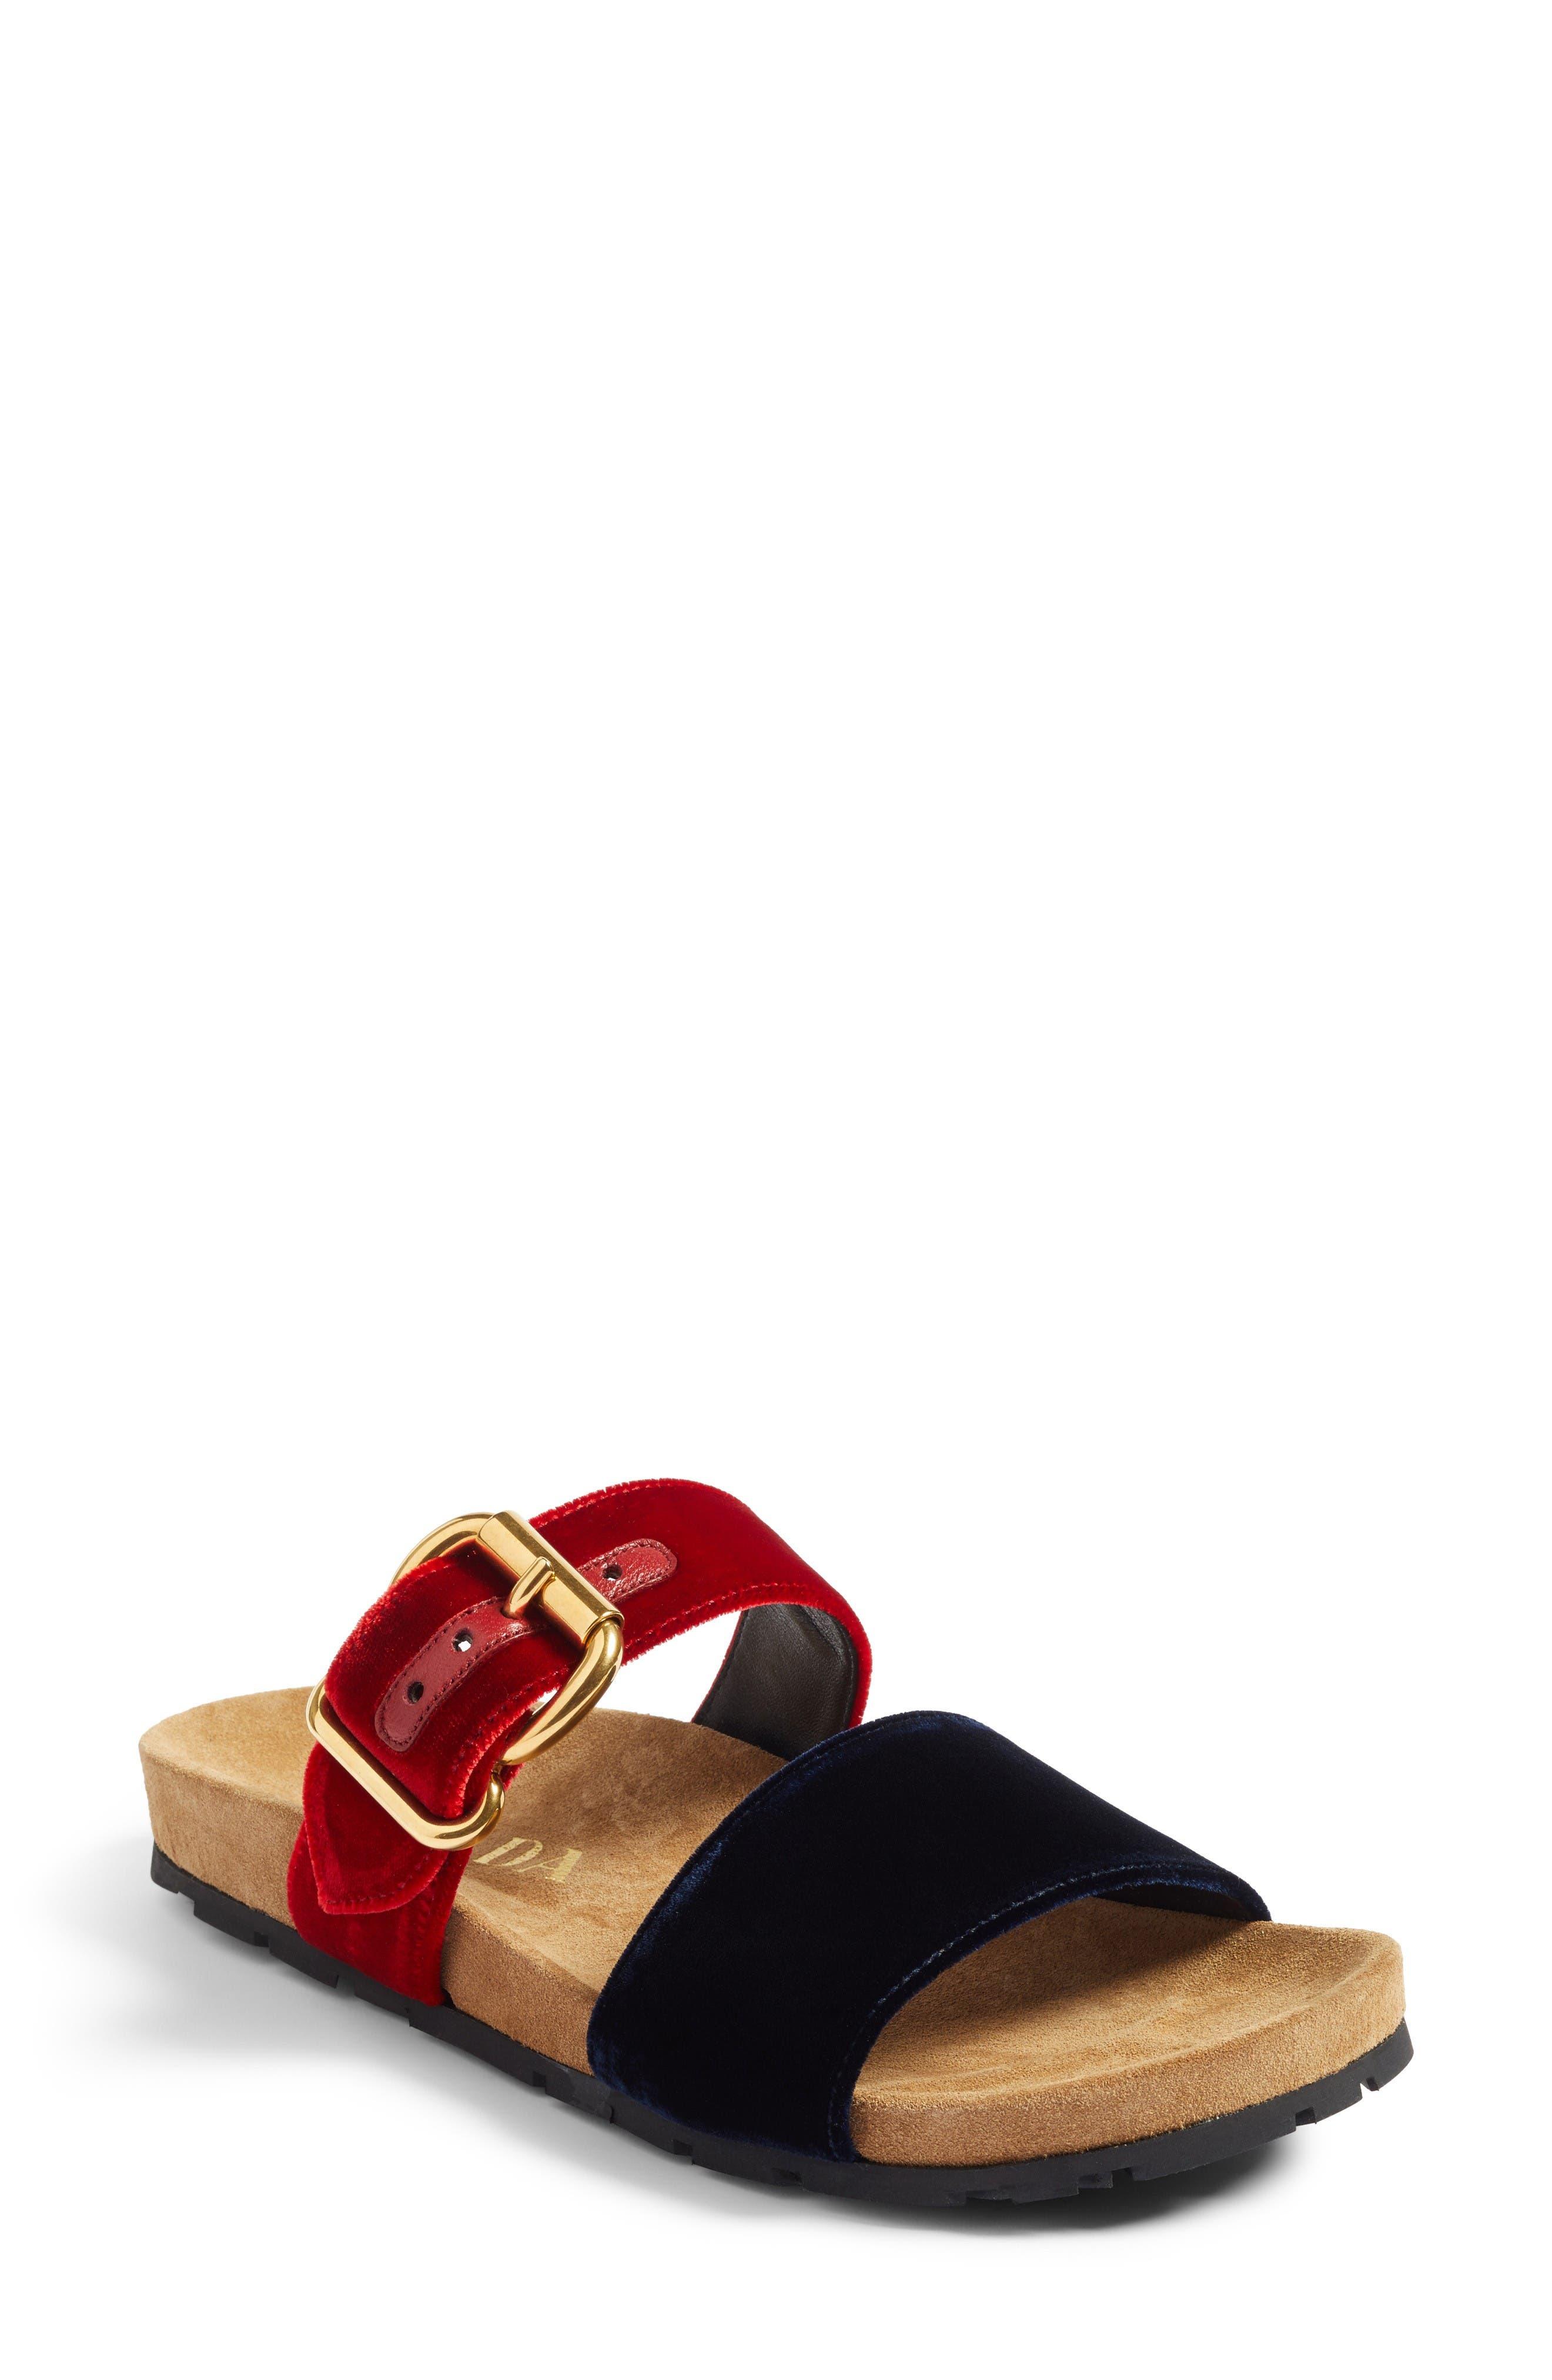 Main Image - Prada Double Band Slide Sandal (Women)